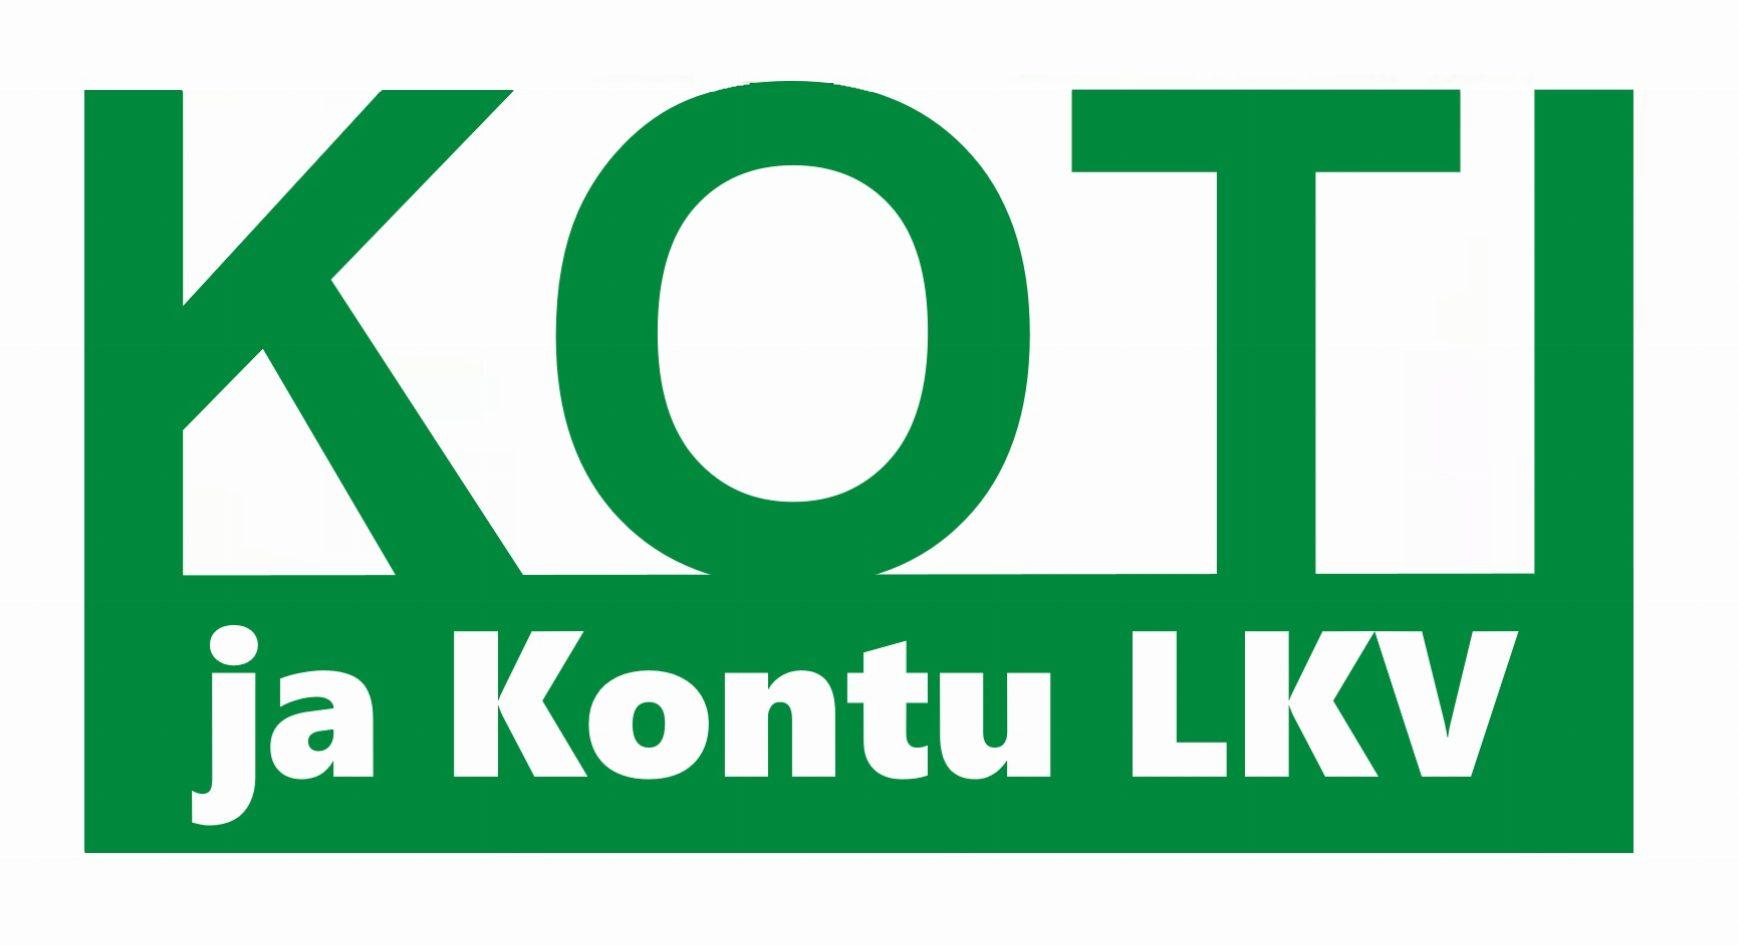 Logo-Uusi-Koti-ja-Kontu-e1537358695687